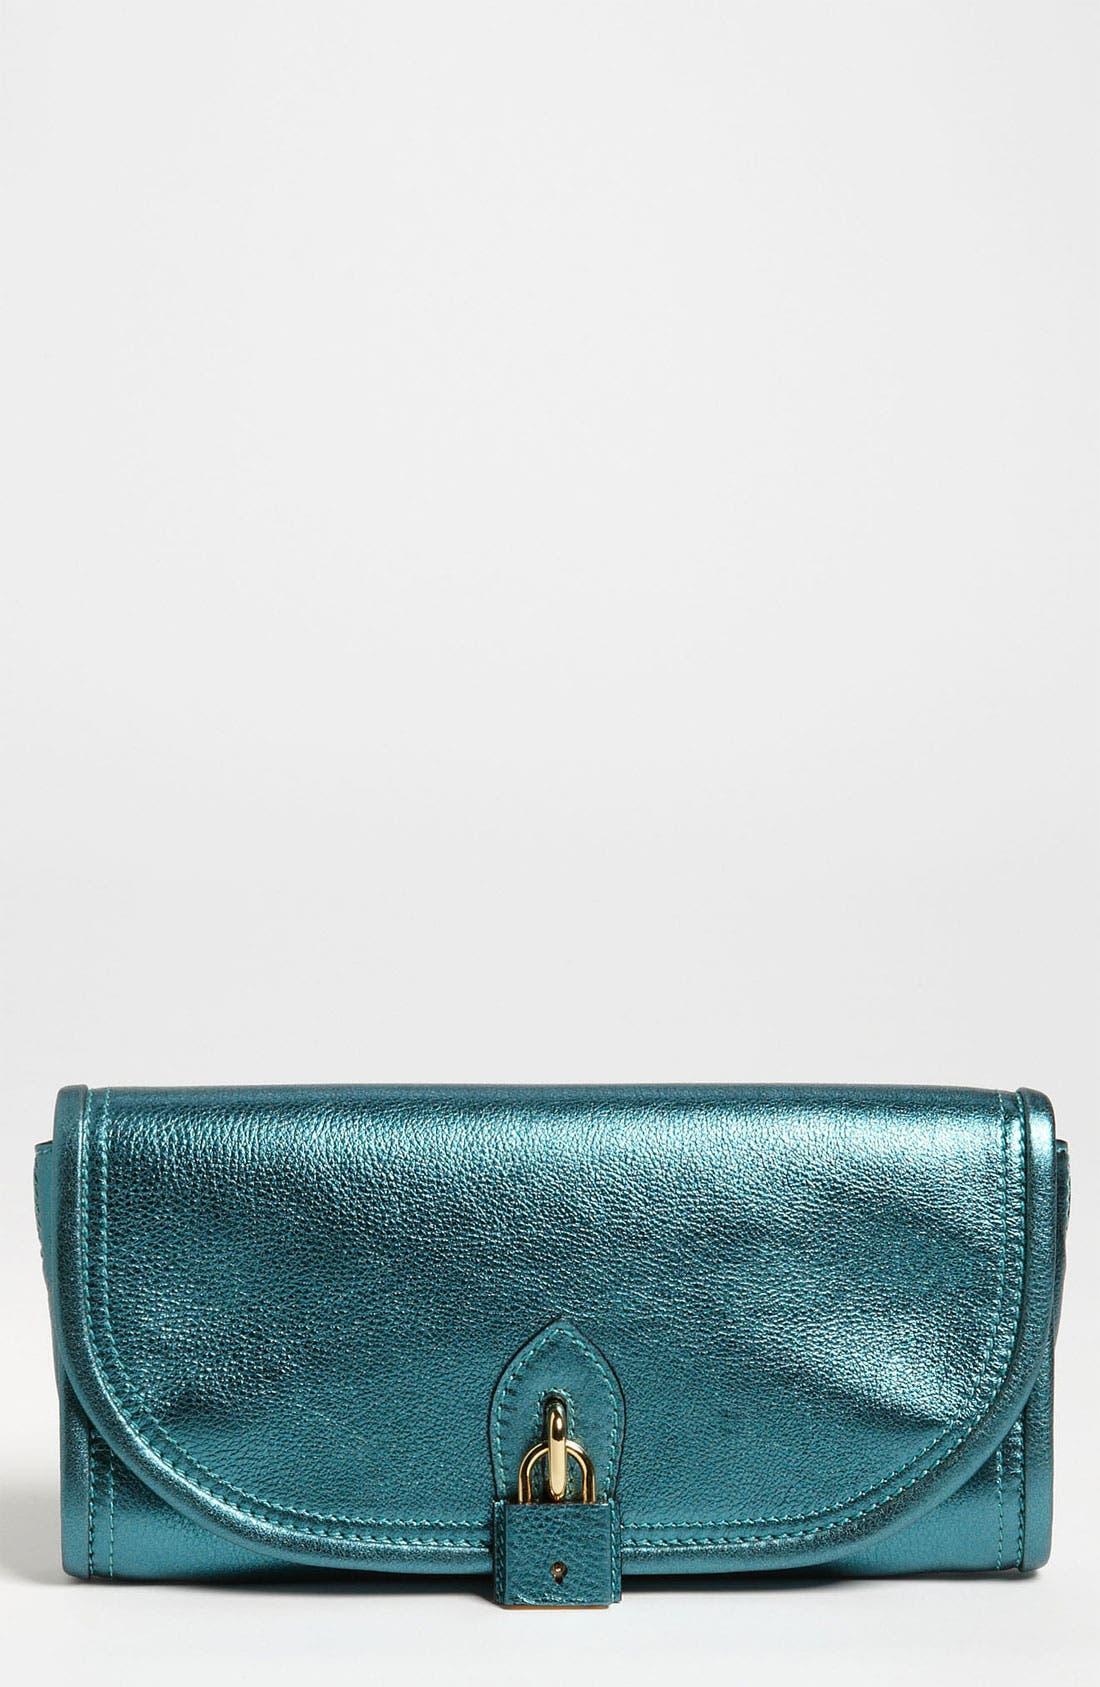 Main Image - Burberry 'Soft Grainy Metallic' Leather Clutch